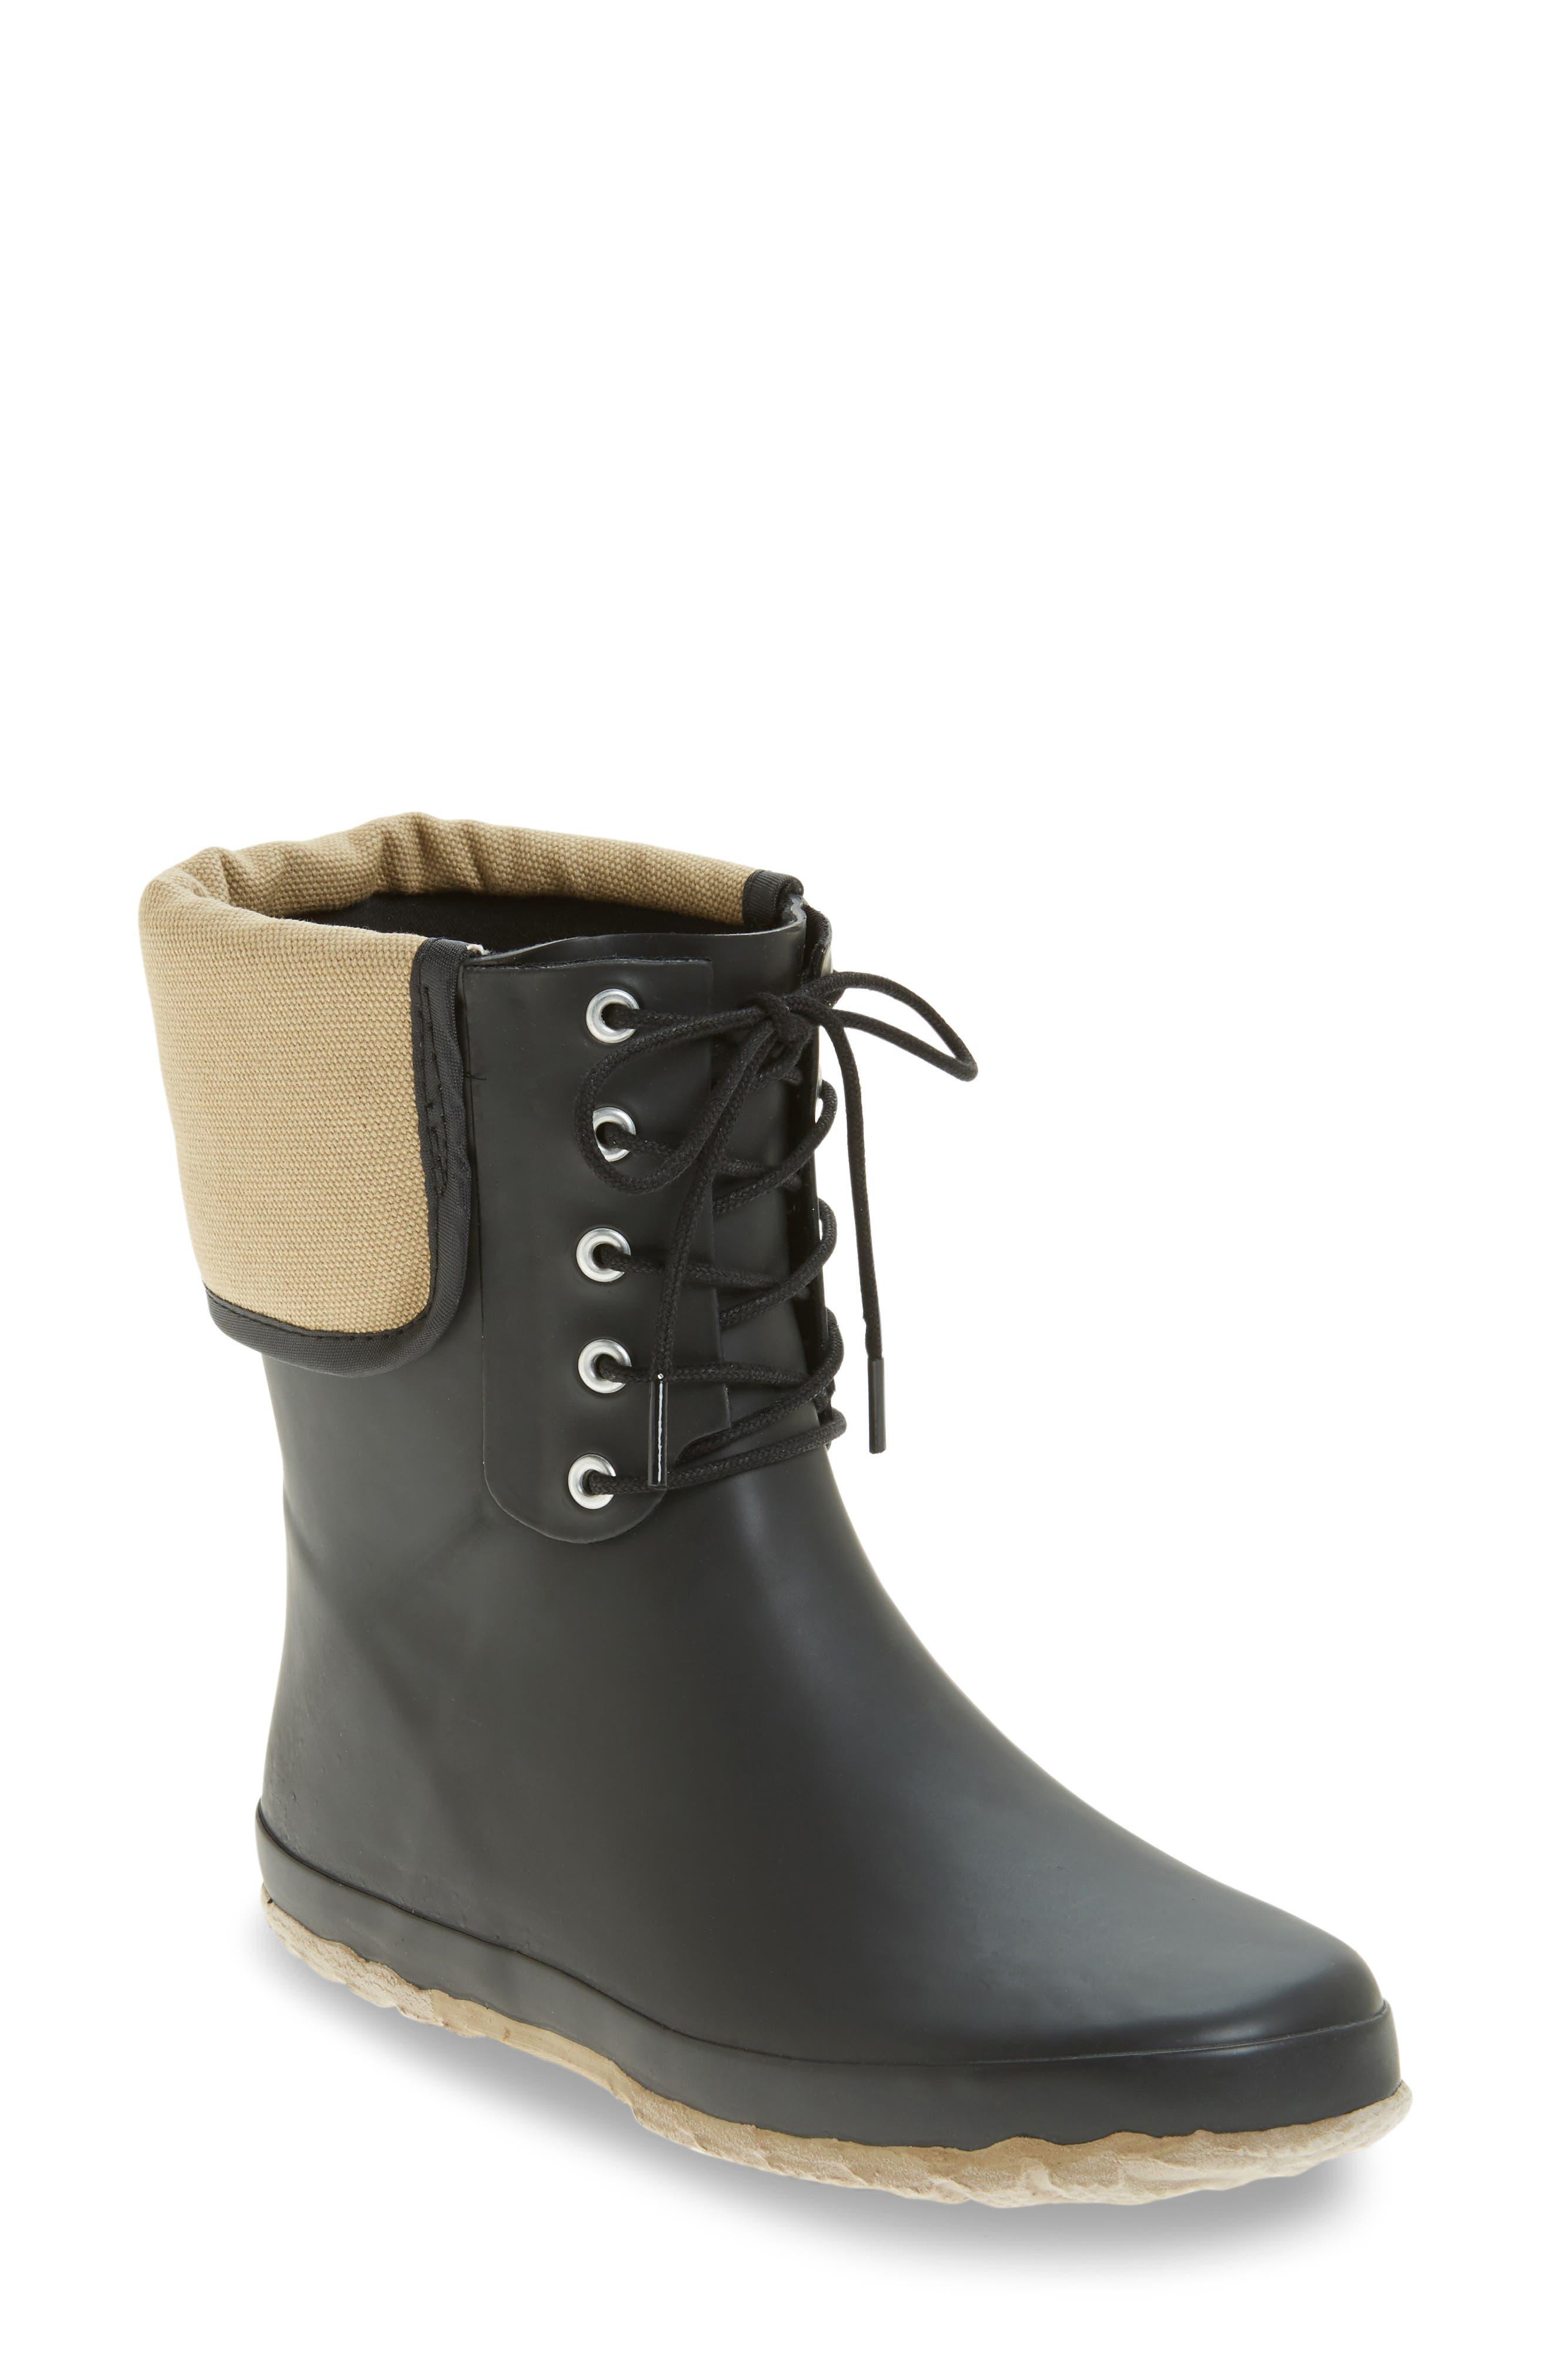 DÄV, Lace-Up Mid Weatherproof Boot, Main thumbnail 1, color, BLACK